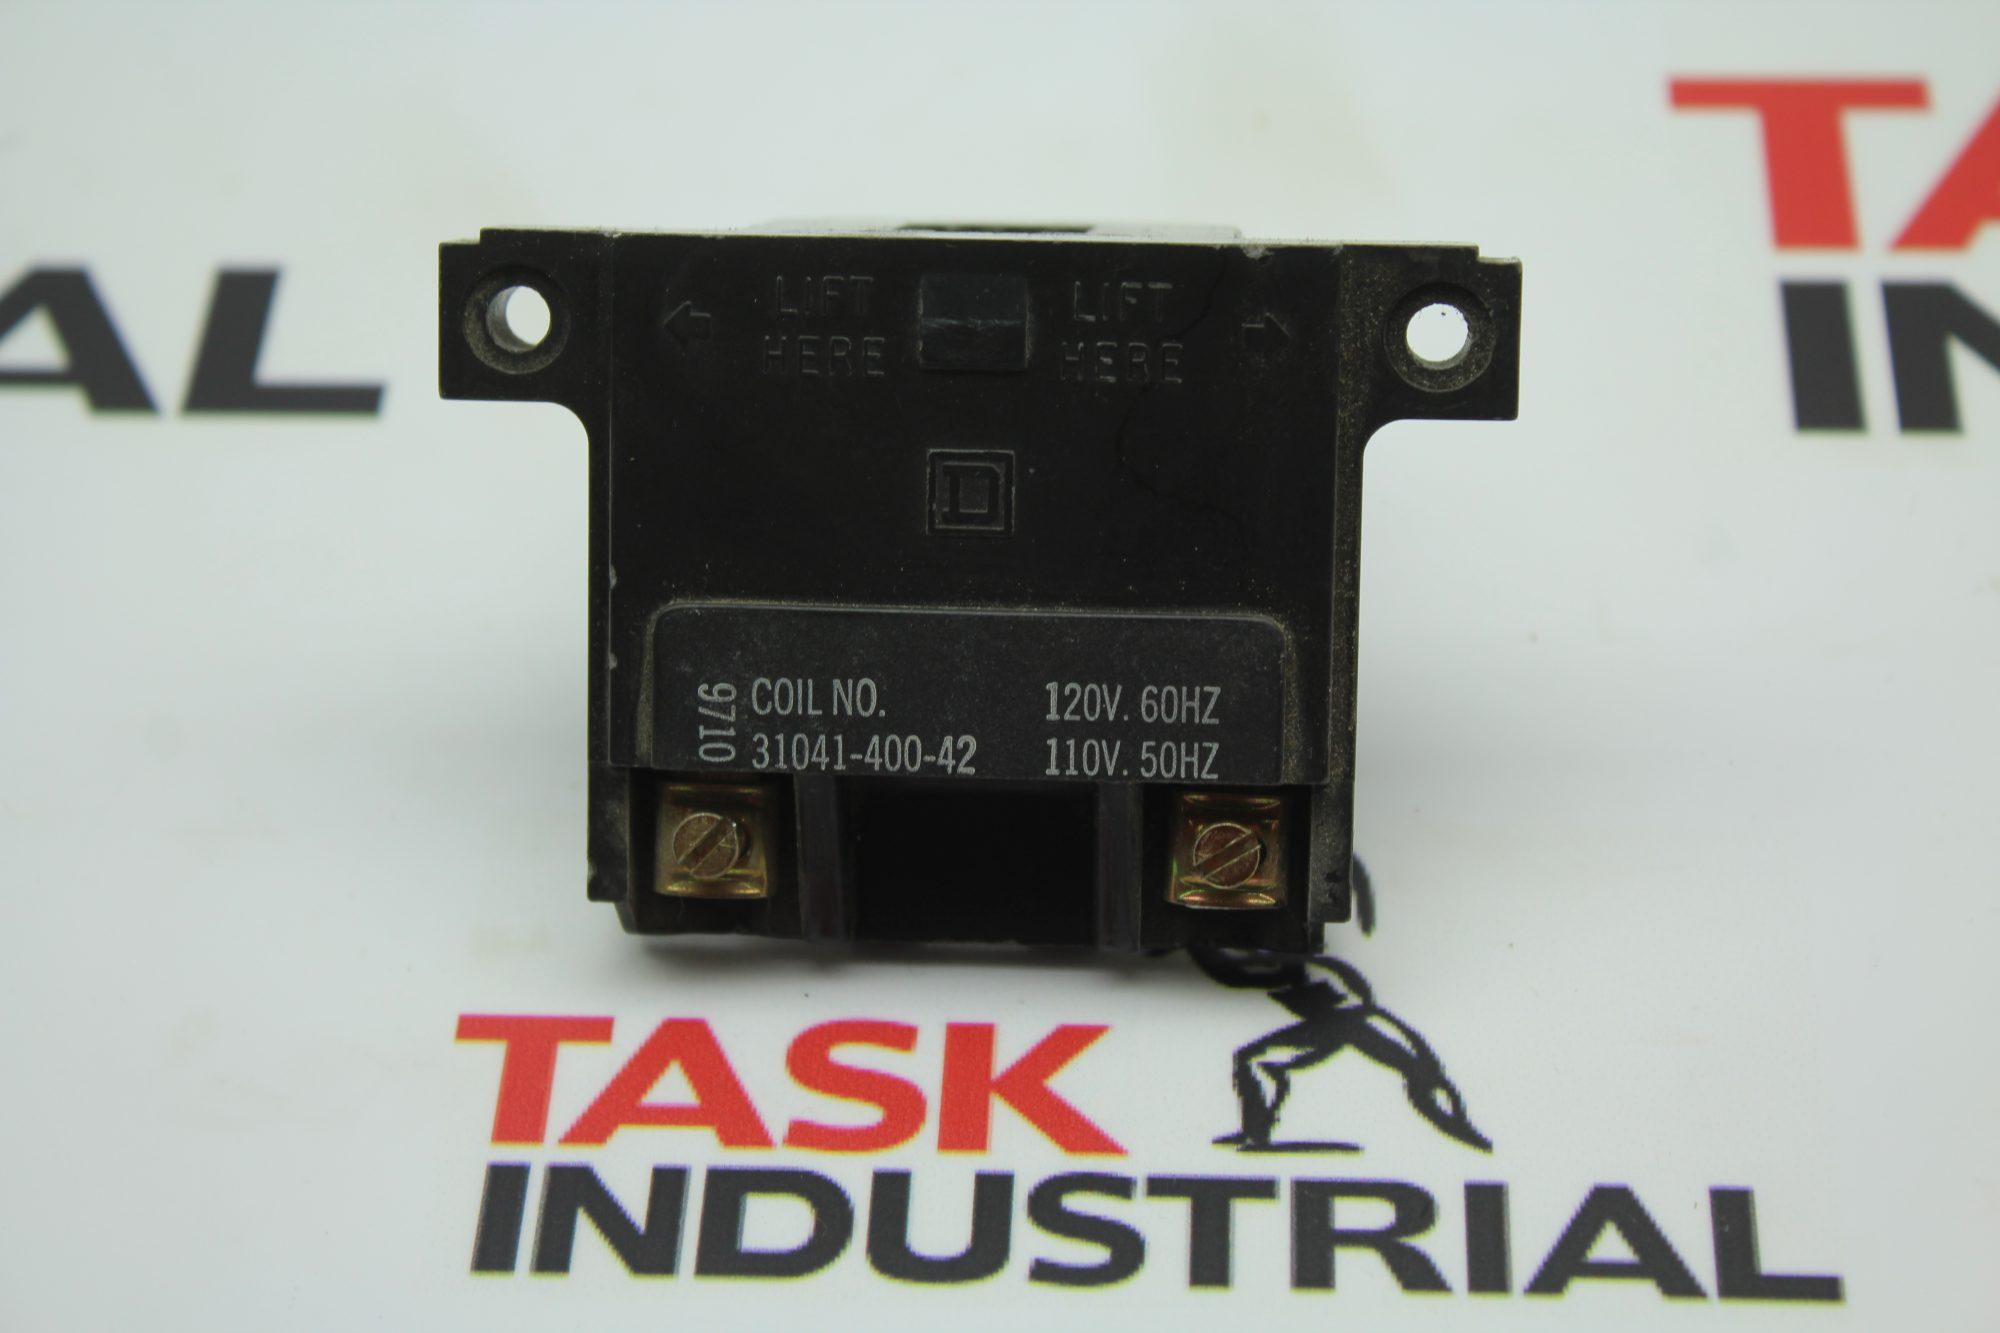 Square D Coil No. 310410400-42